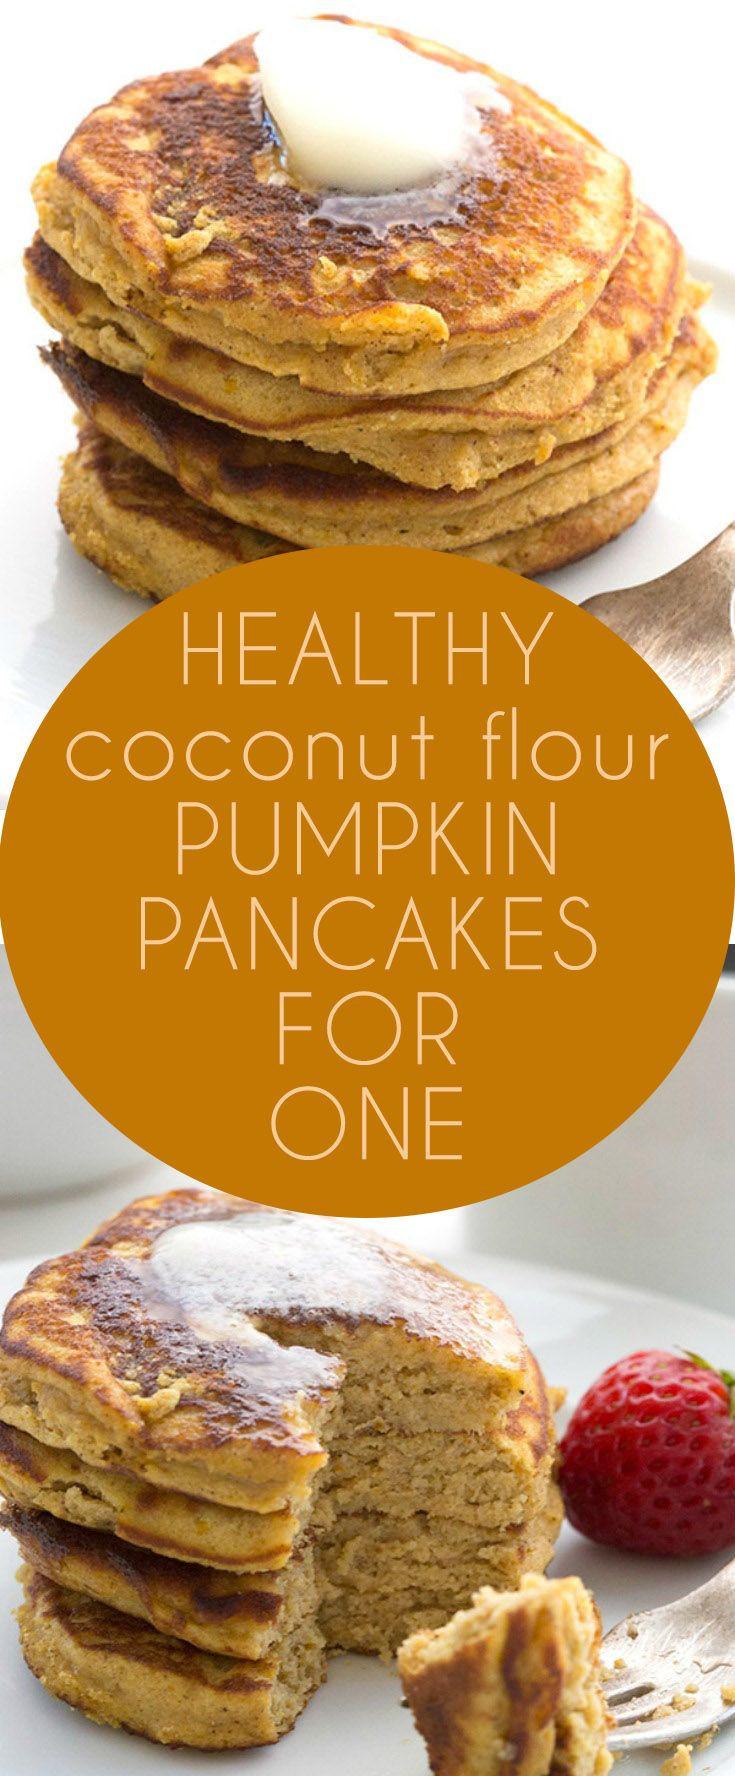 Keto Pumpkin Pancakes  Low Carb Coconut Flour Pumpkin Pancakes A great grain